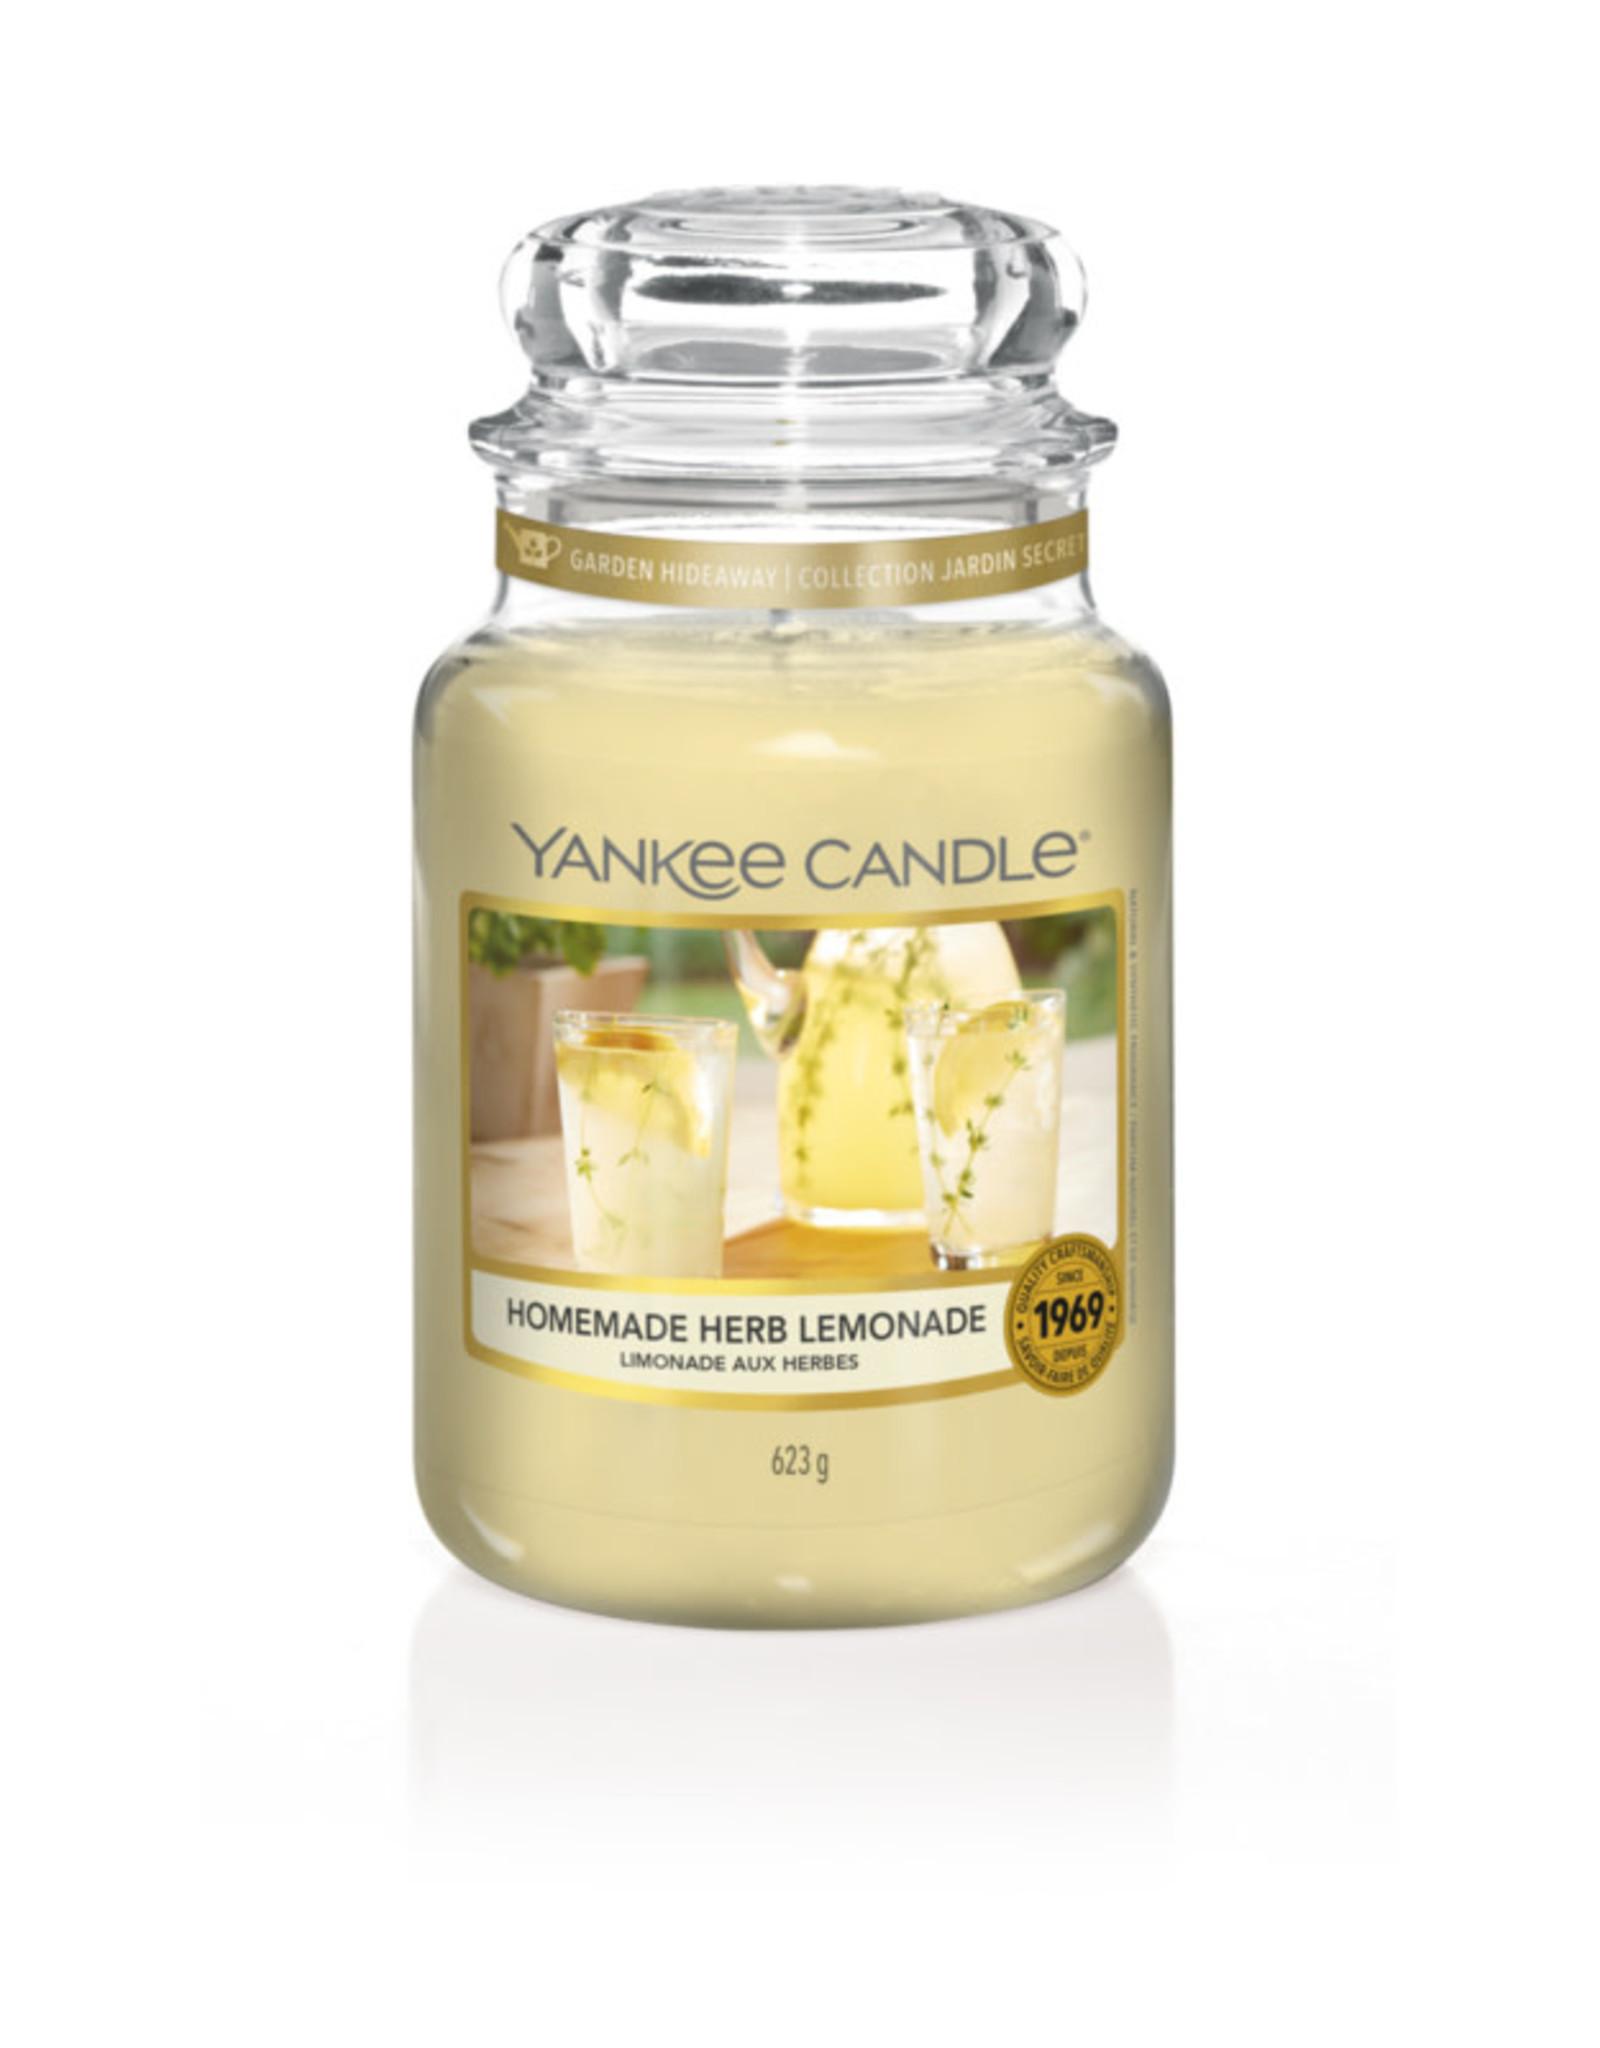 Yankee Candle Homemade Herb Lemonade Yankee Candle Large